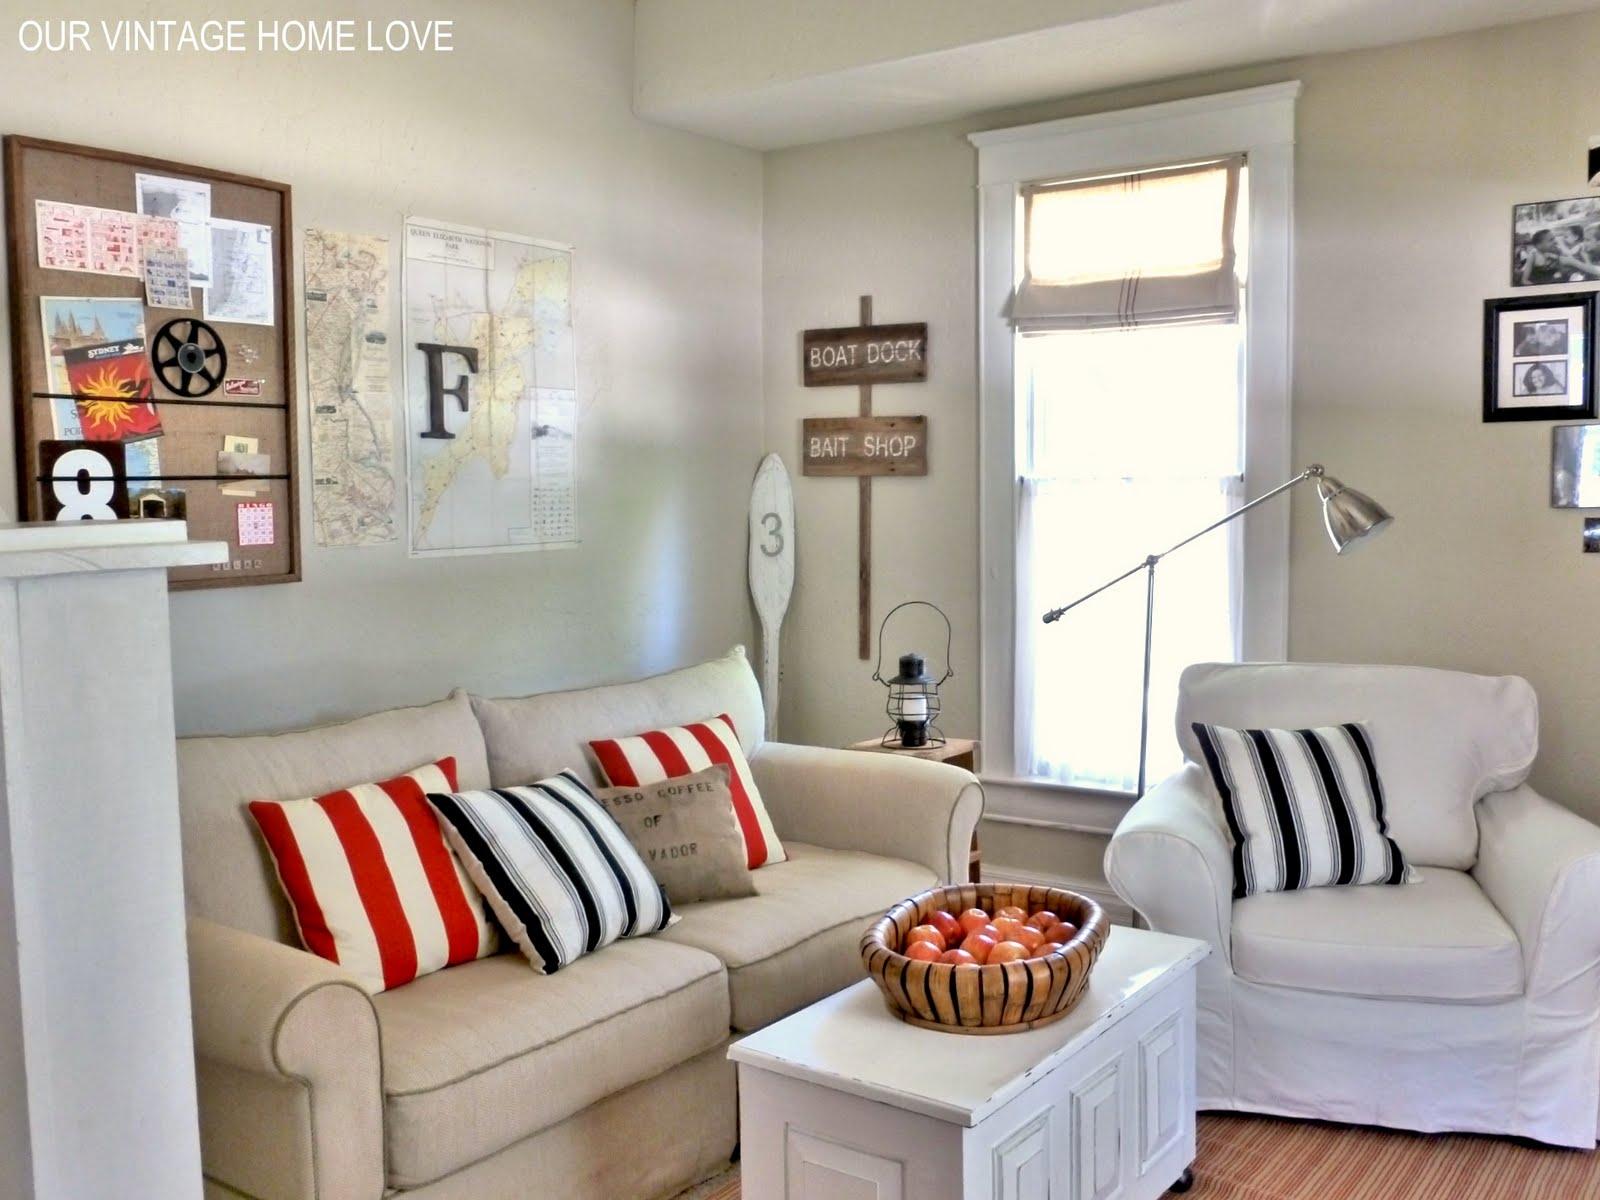 Vintage Home Love: Family Room/Den Ideas